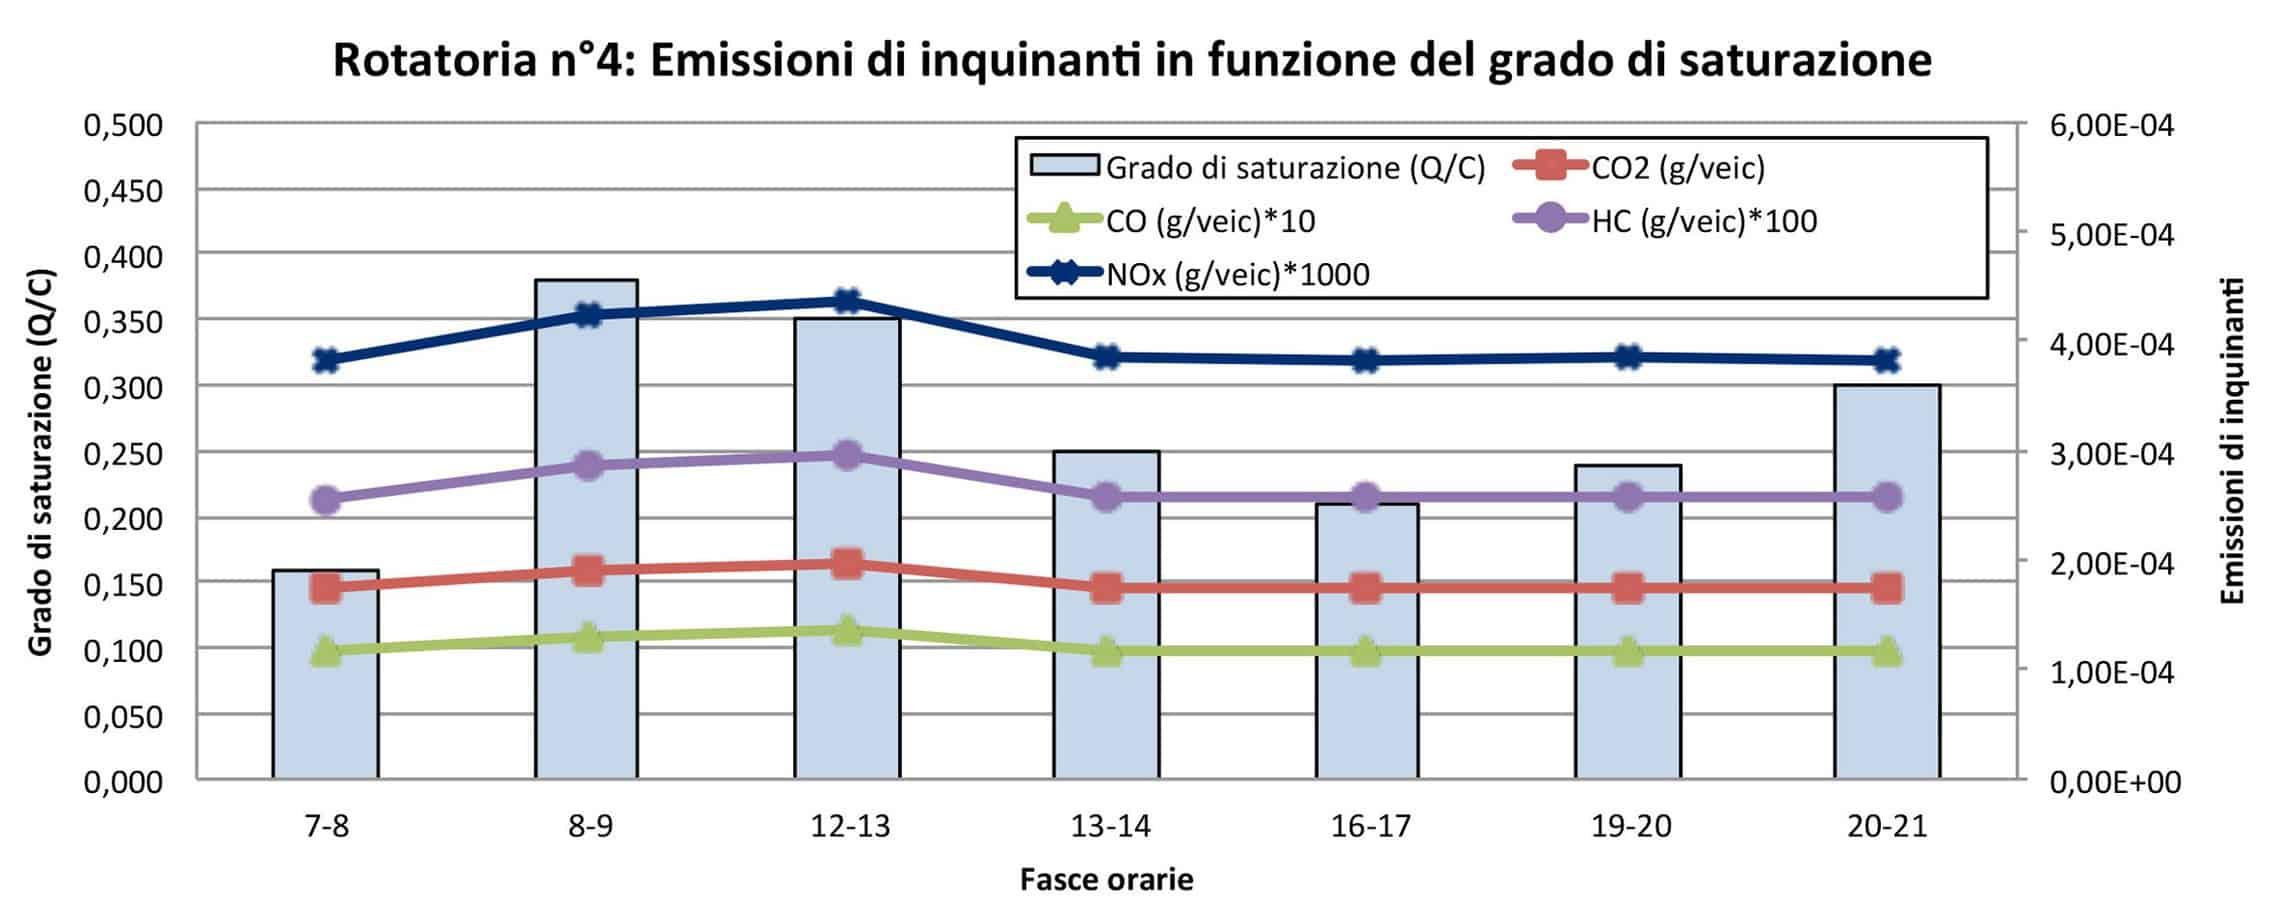 Le emissioni di inquinanti in funzione del grado di saturazione (rotatoria n° 4)